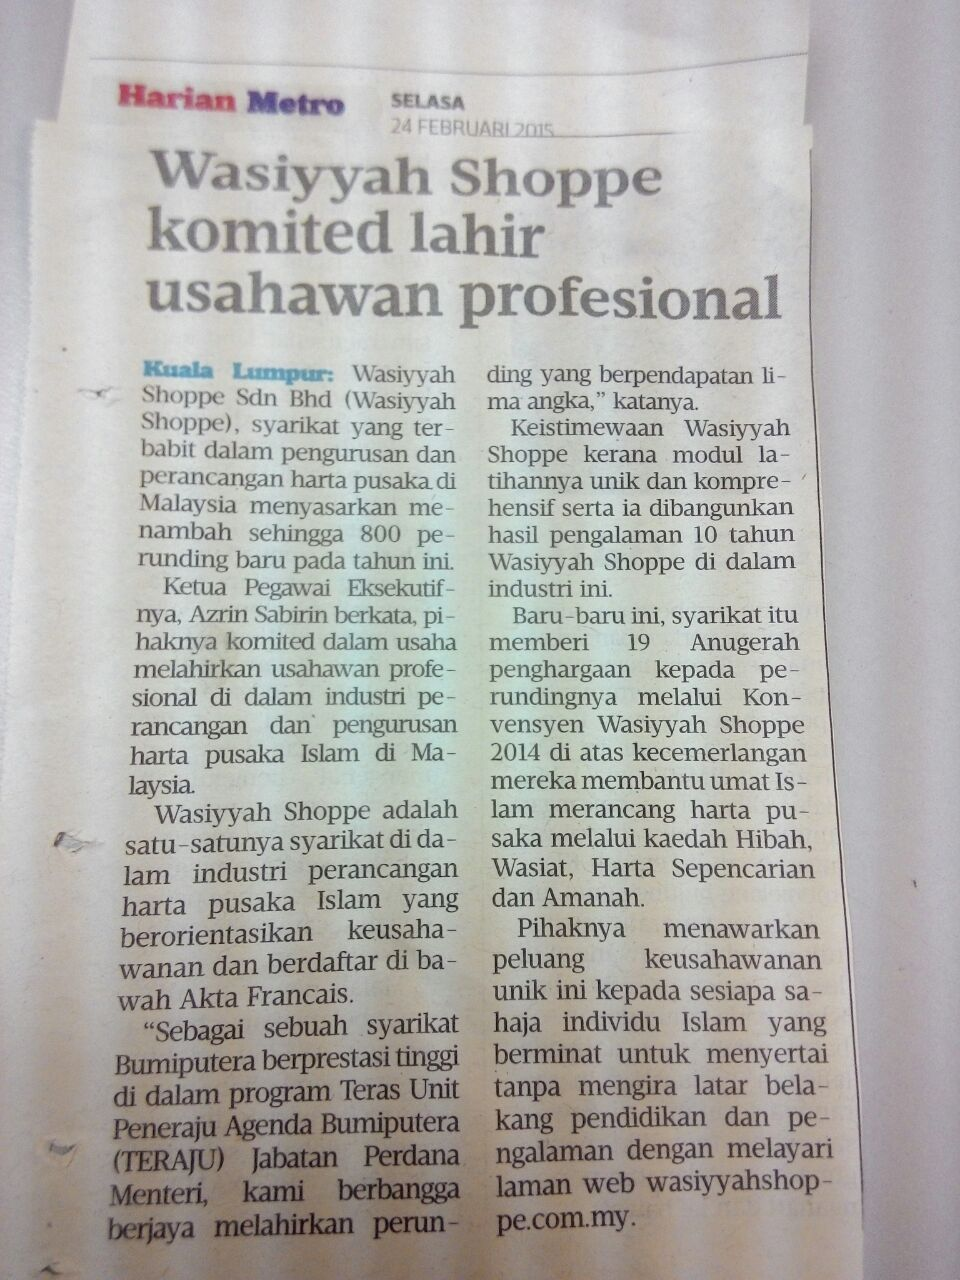 Wasiyyah Shoppe komited lahir usahawan profesional